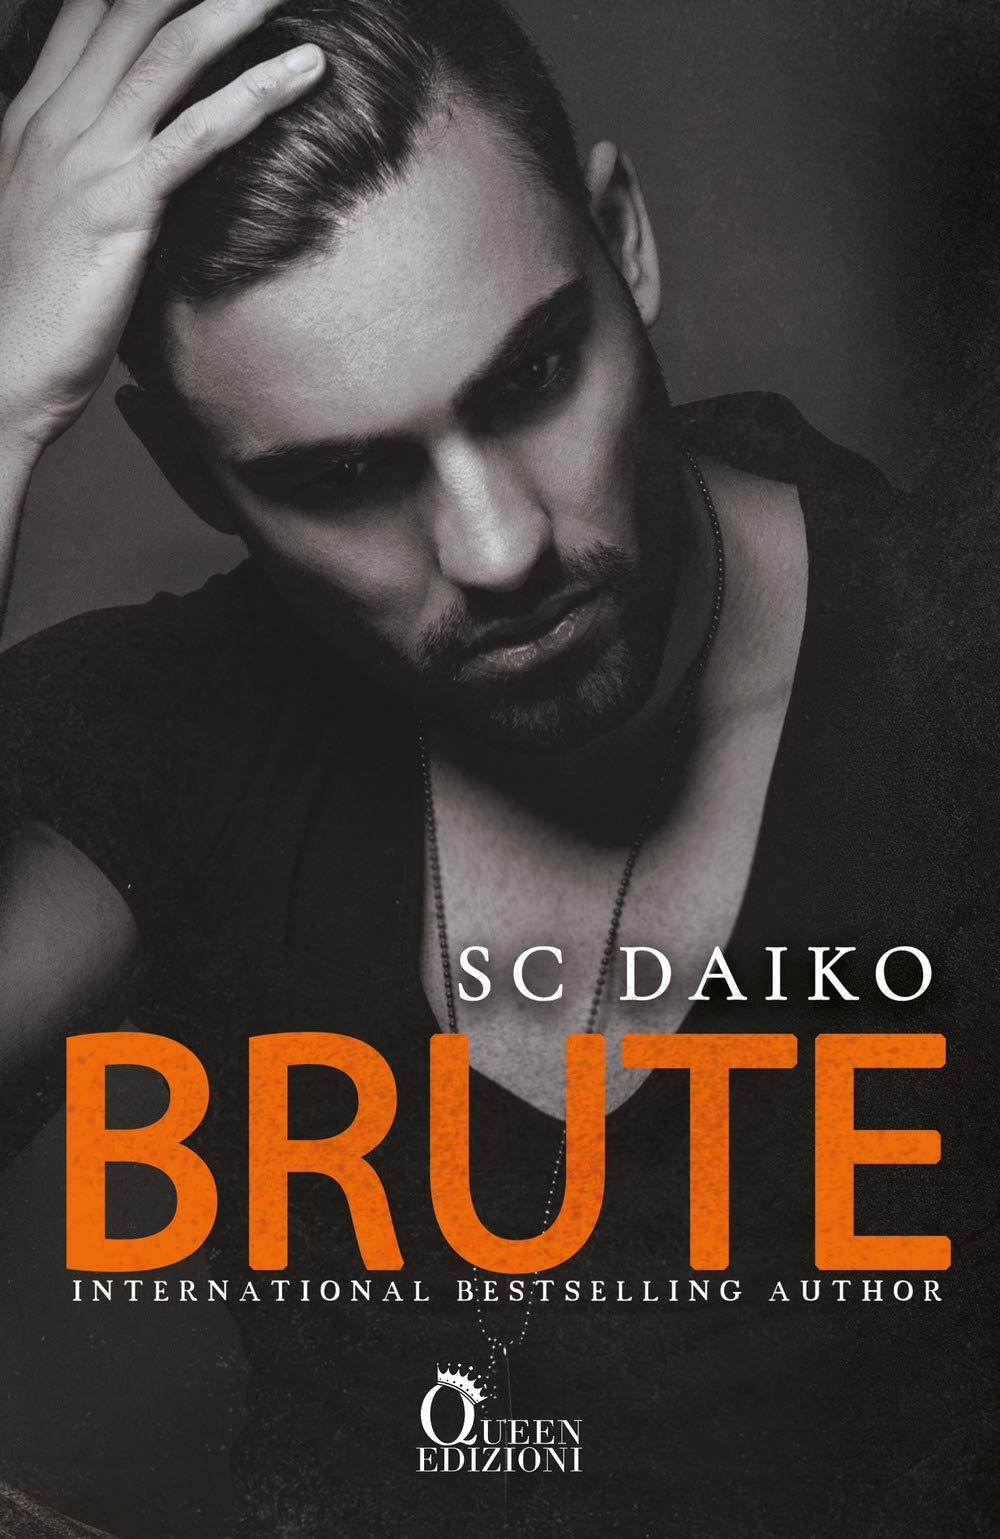 Amazon.it: Brute - SC Daiko, Moroni, M. - Libri